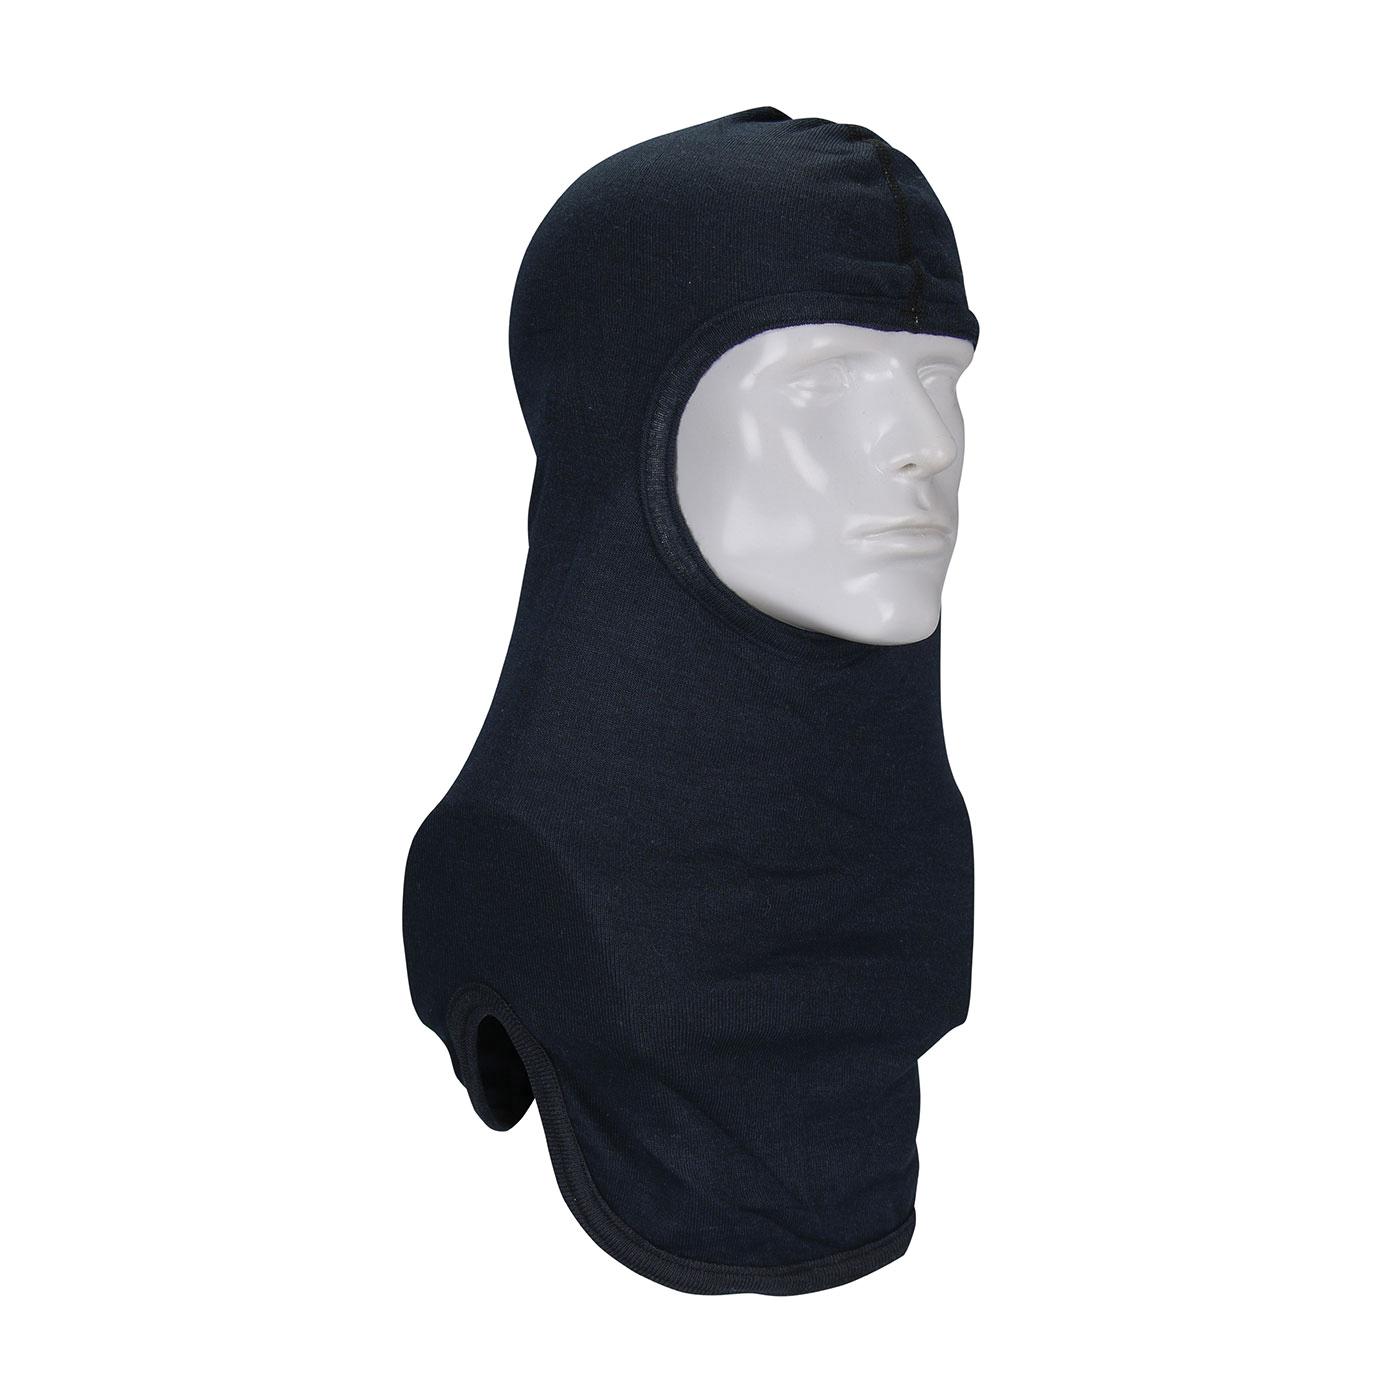 PIP® 906-2080NOL7BLKB Single Layer Fire Resistant Hood With Bib, Universal, Black, 16 in L, 20% Nomex®/80% Lenzing, 4 oz Fabric, Straight Cut Full Face Closure